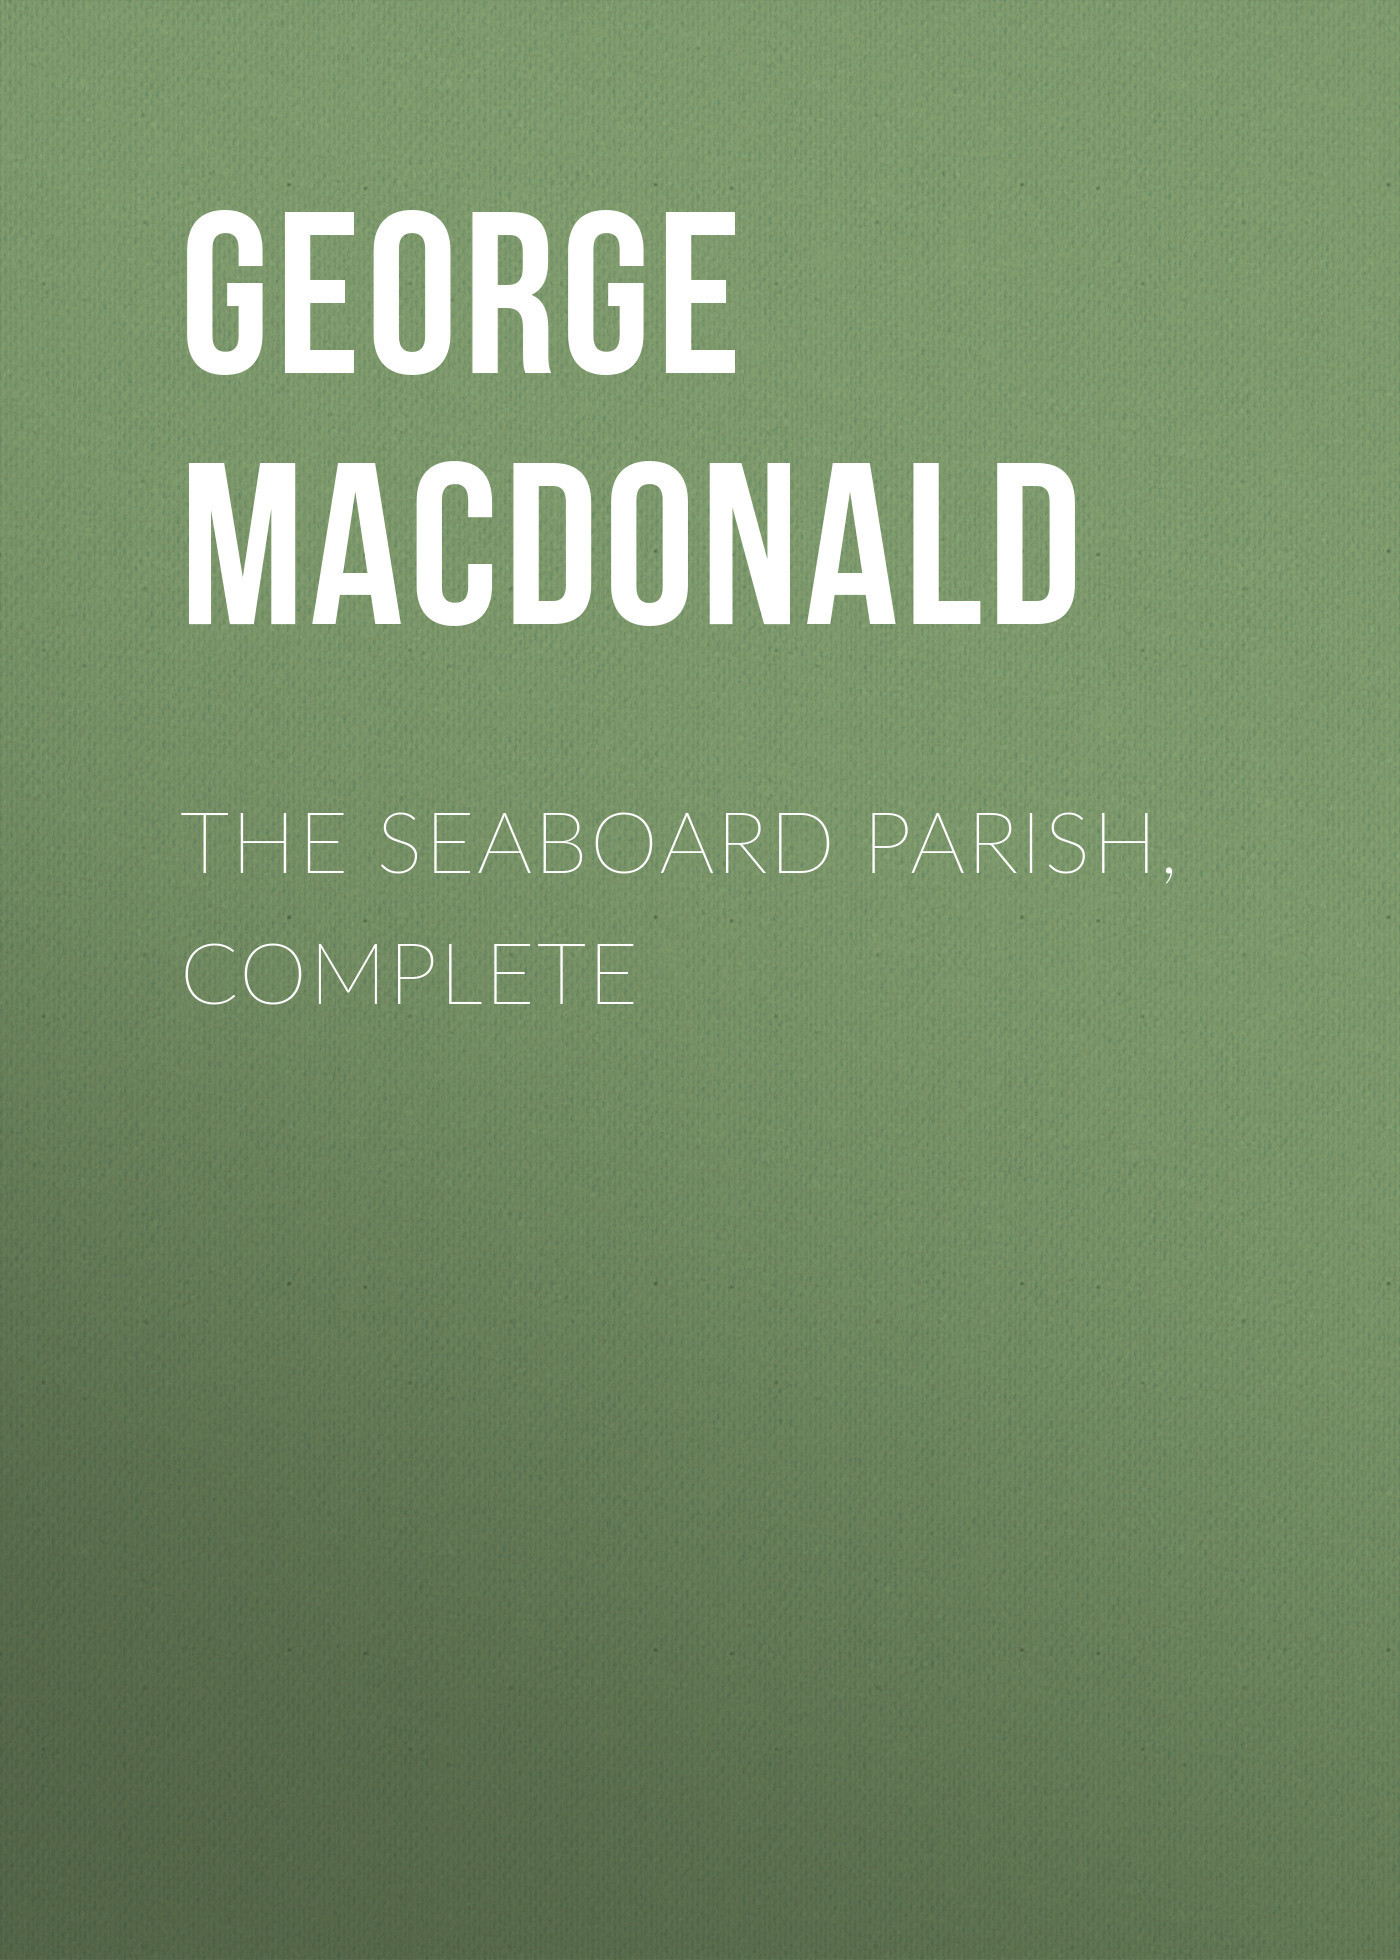 George MacDonald The Seaboard Parish, Complete george macdonald what s mine s mine complete